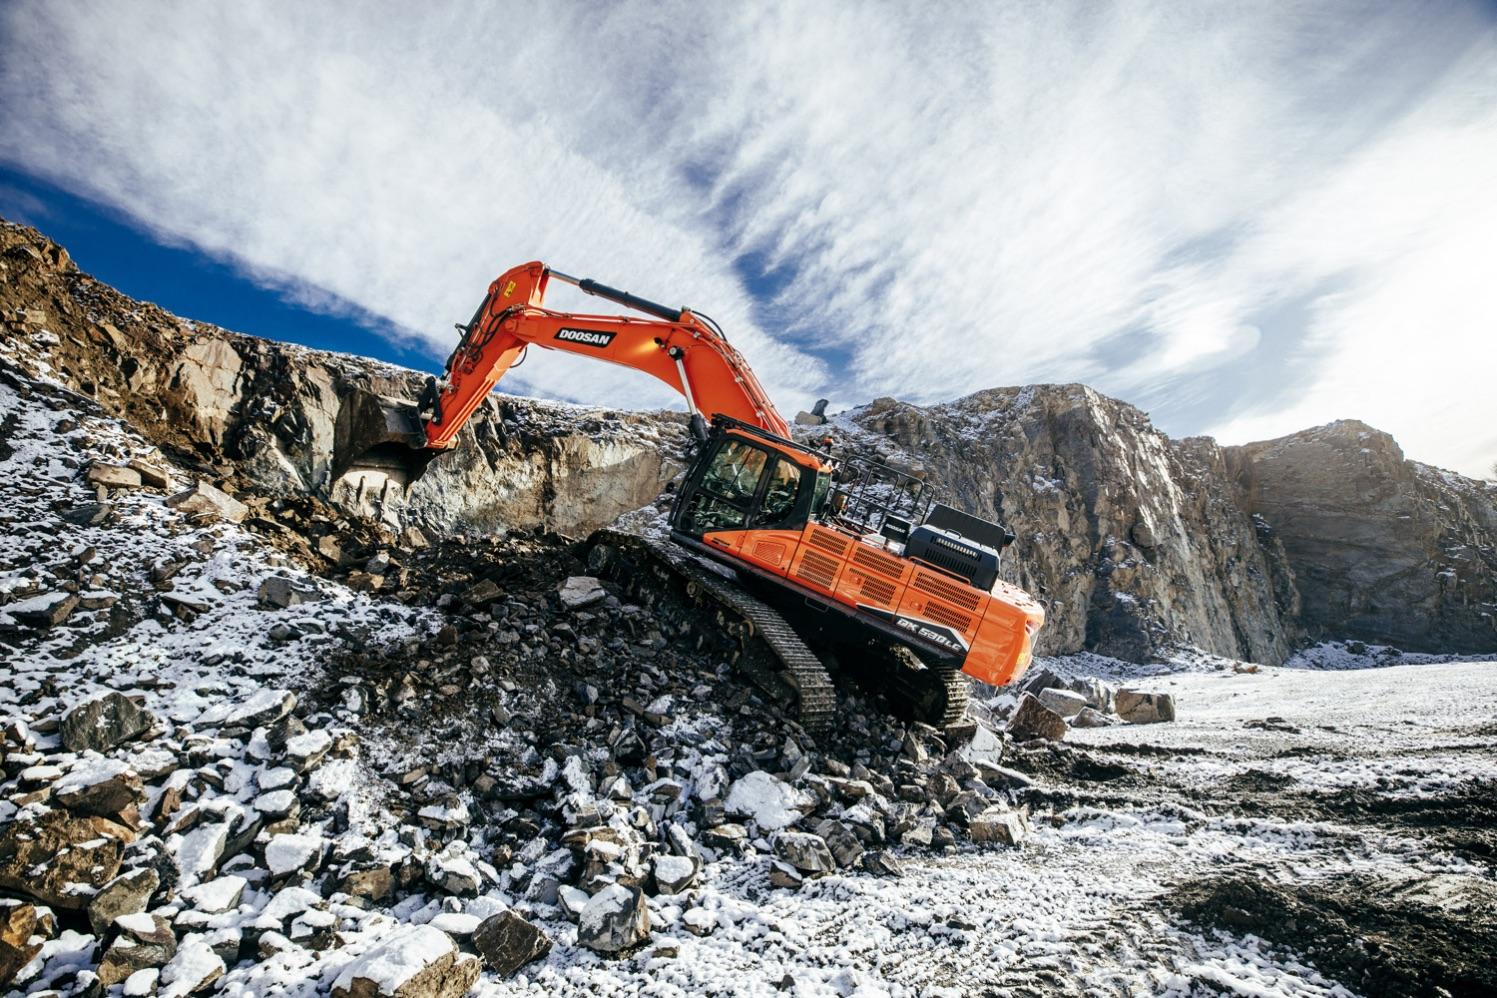 Doosan DX530 crawler excavator in a quarry